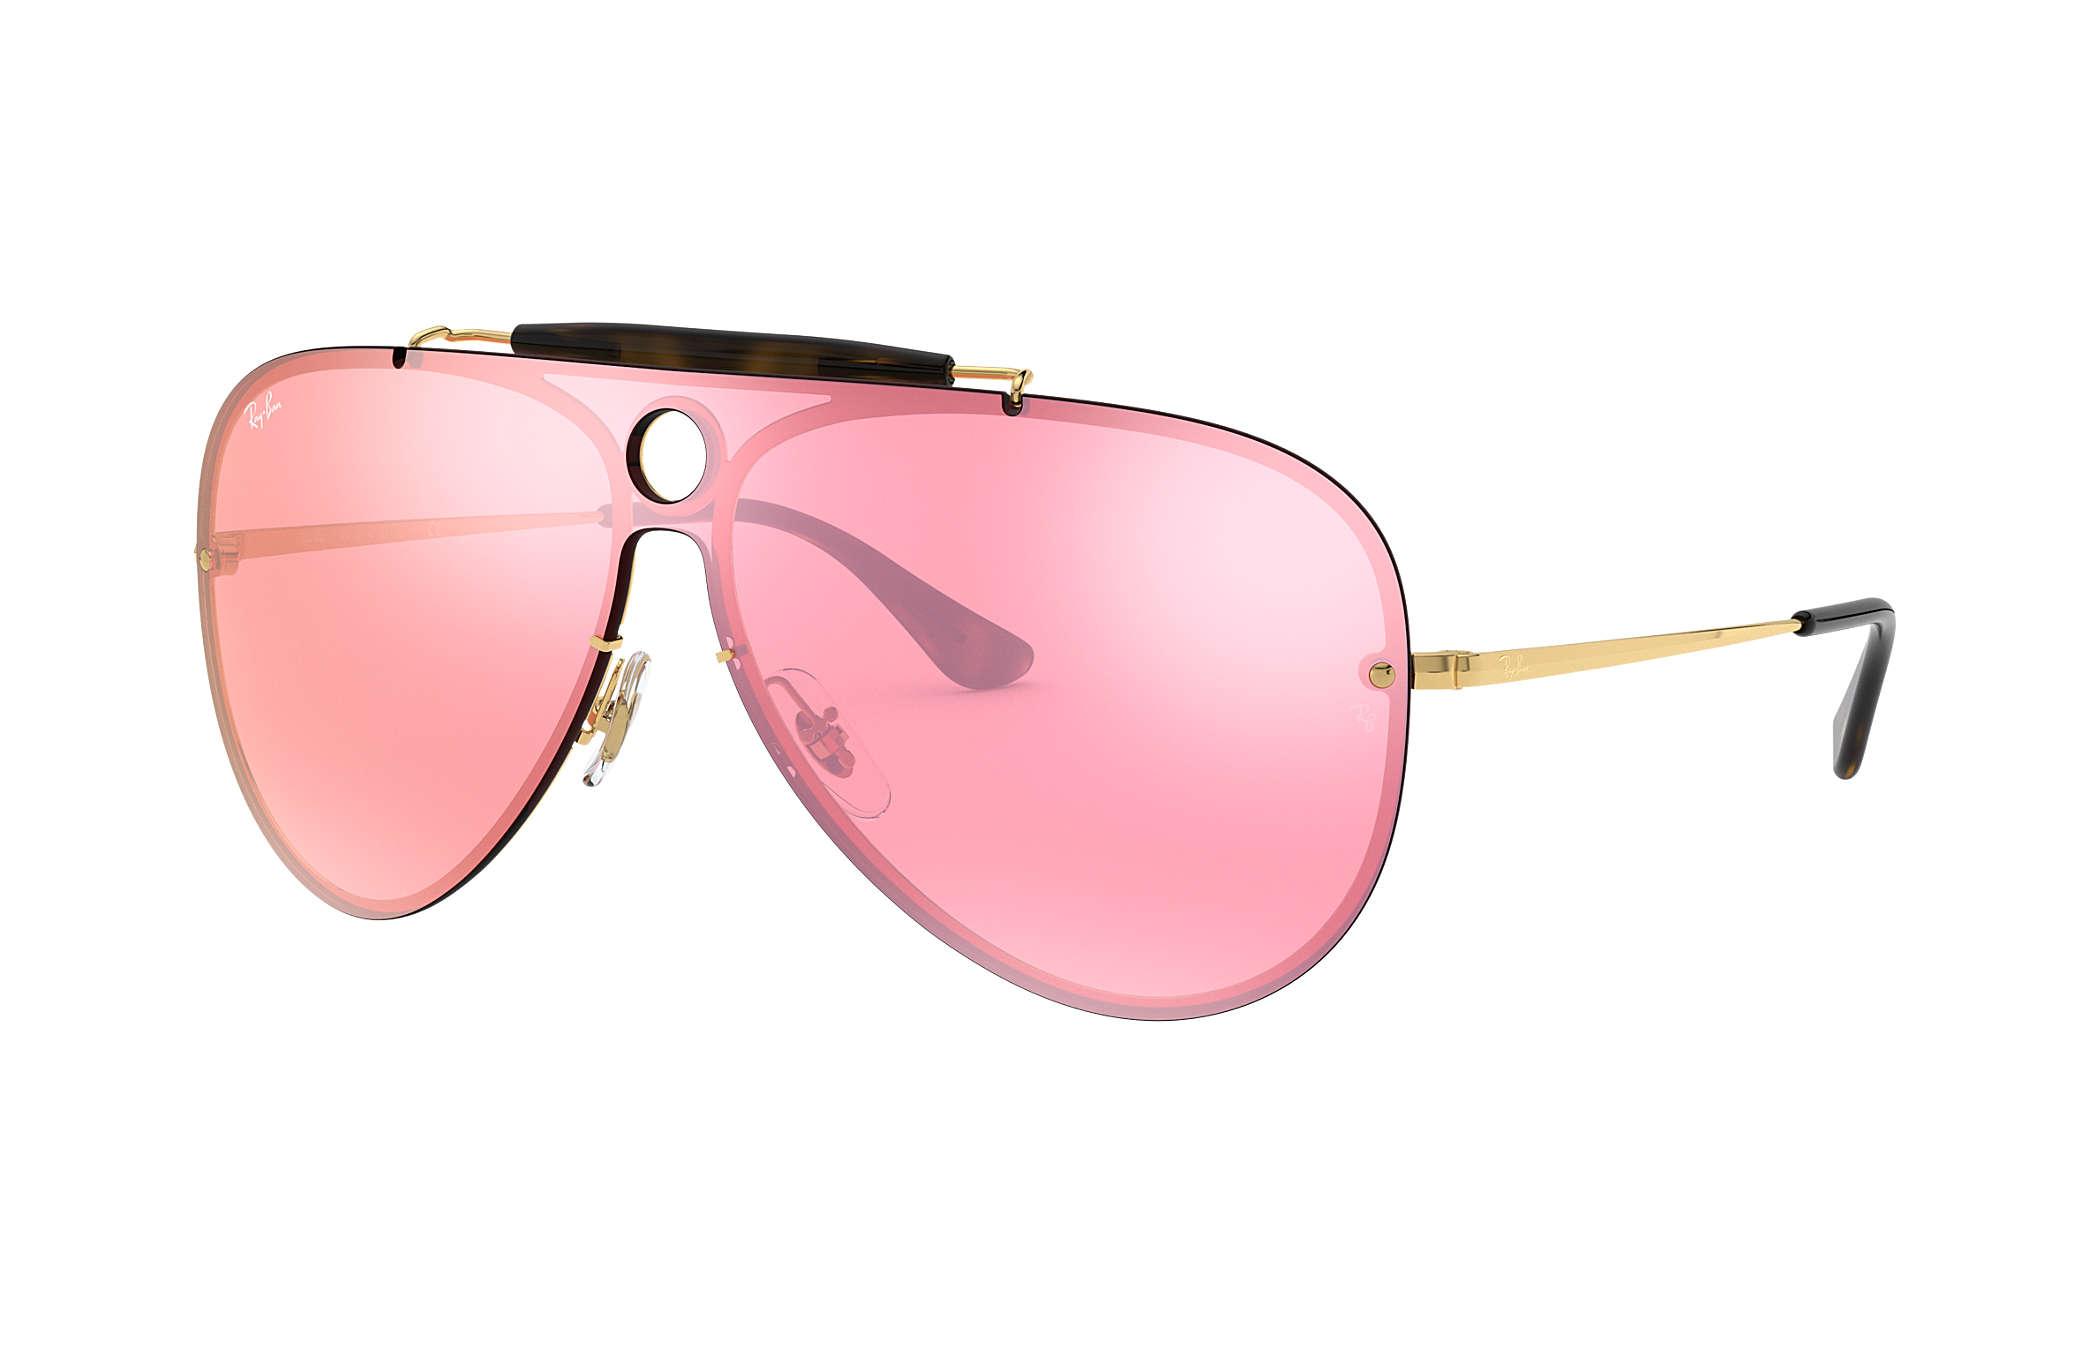 bea57702220 Ray-Ban Blaze Hexagonal RB3579N Gold - Metal - Pink Lenses ...